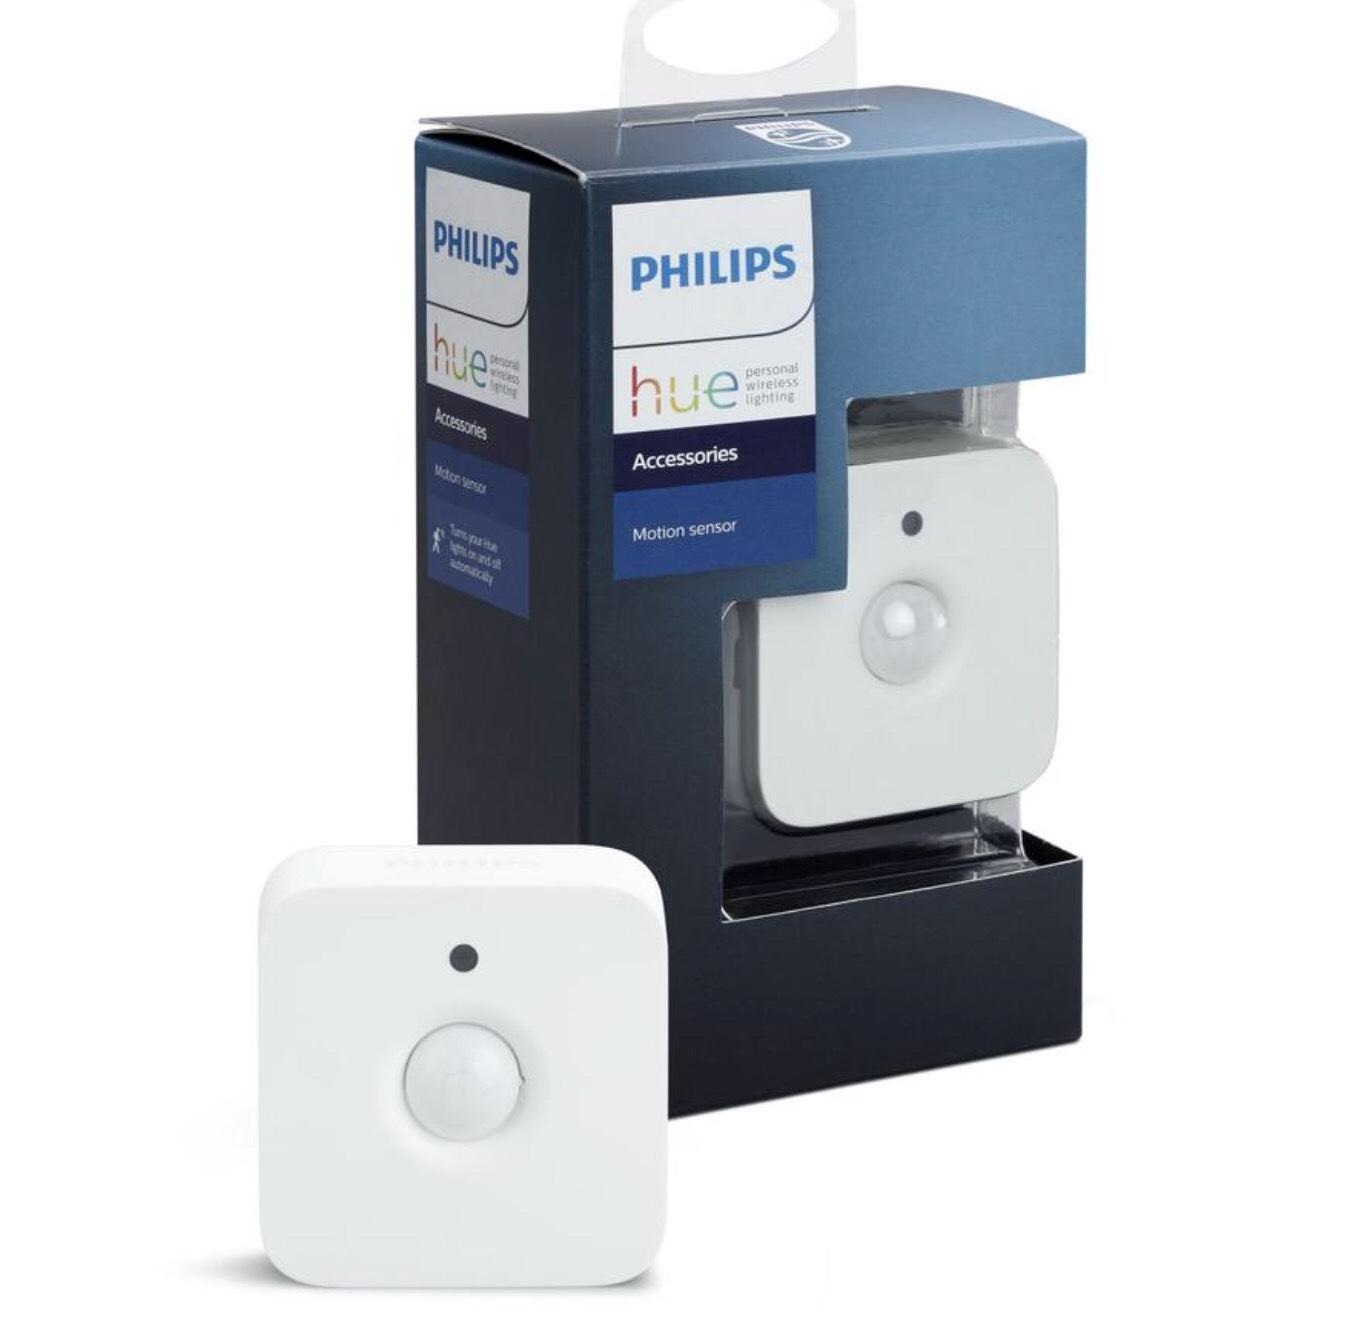 philips hue bewegungssensor motion sensor. Black Bedroom Furniture Sets. Home Design Ideas